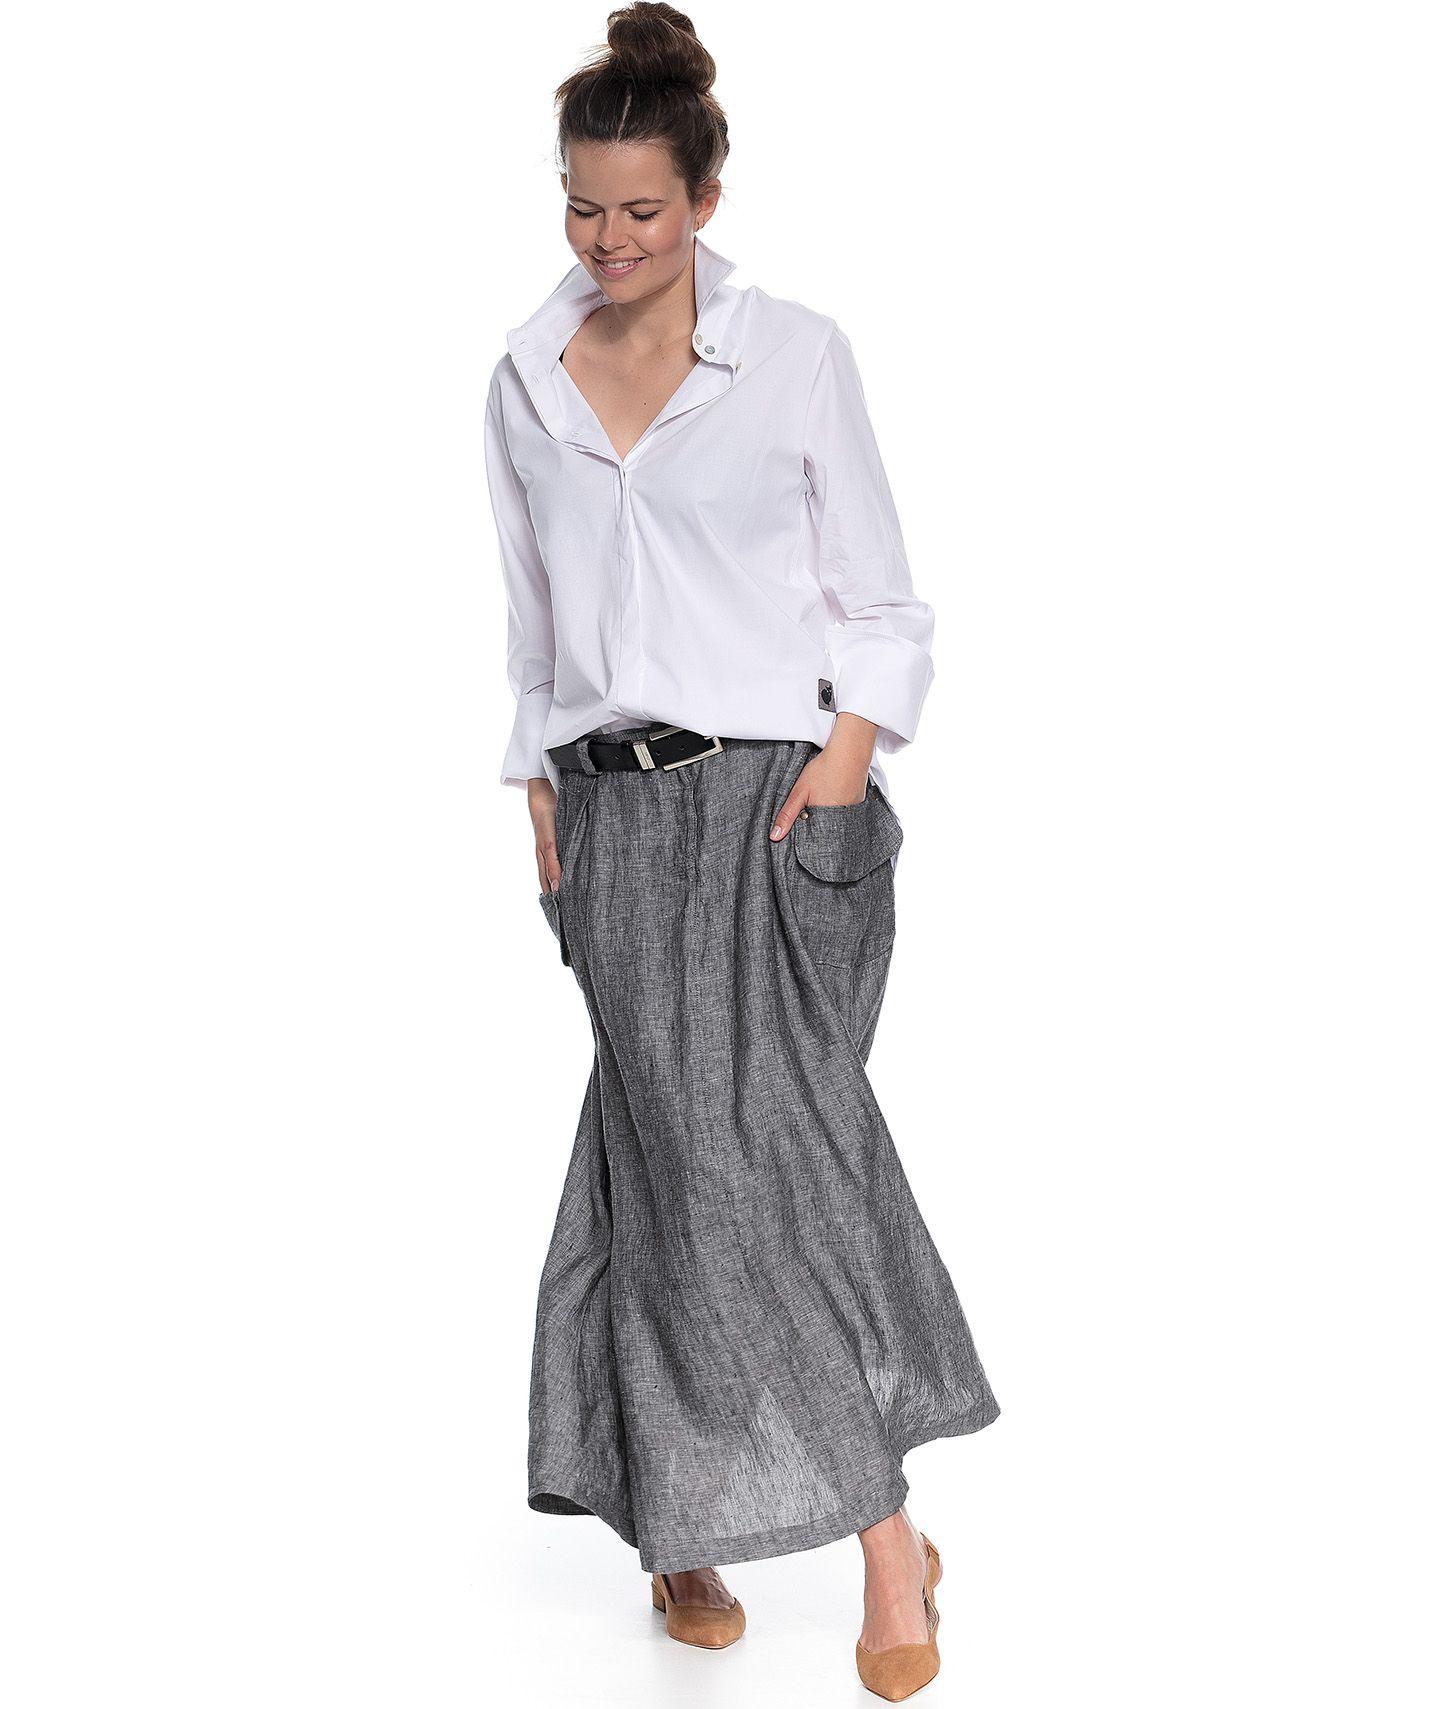 spódnica AVA skirt grey